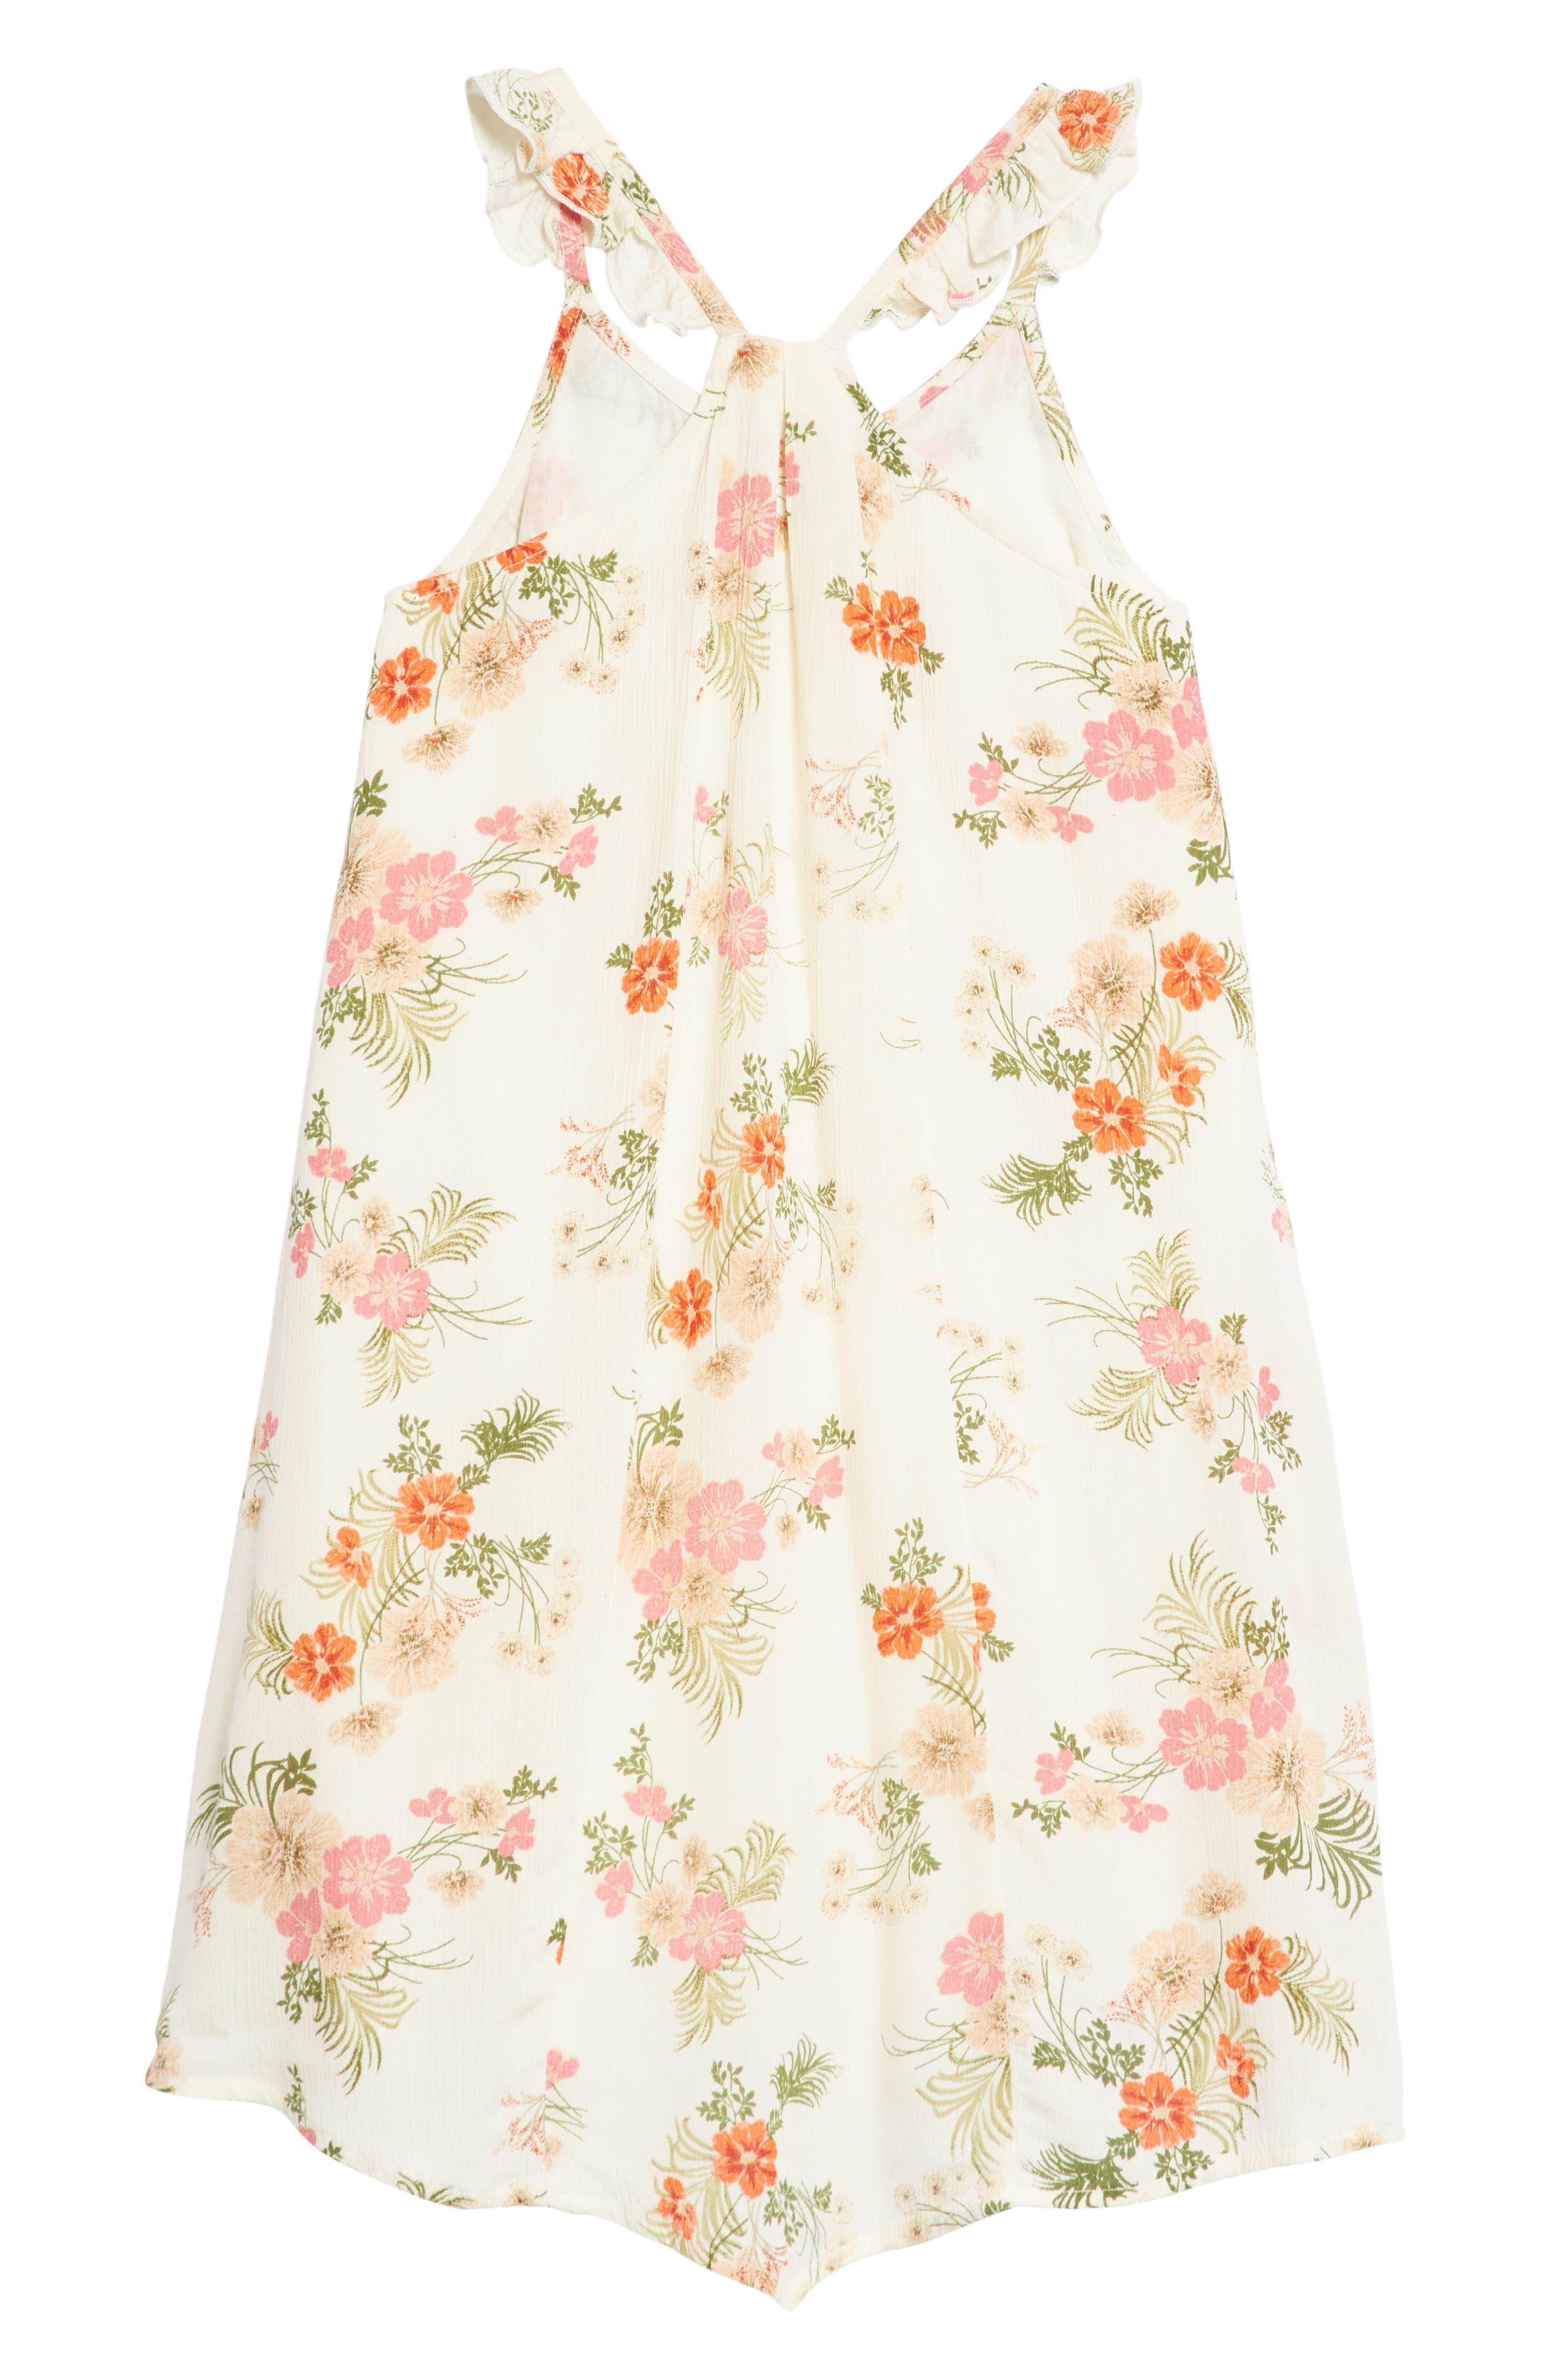 Ashley Print Dress,                             Alternate thumbnail 3, color,                             White Floral